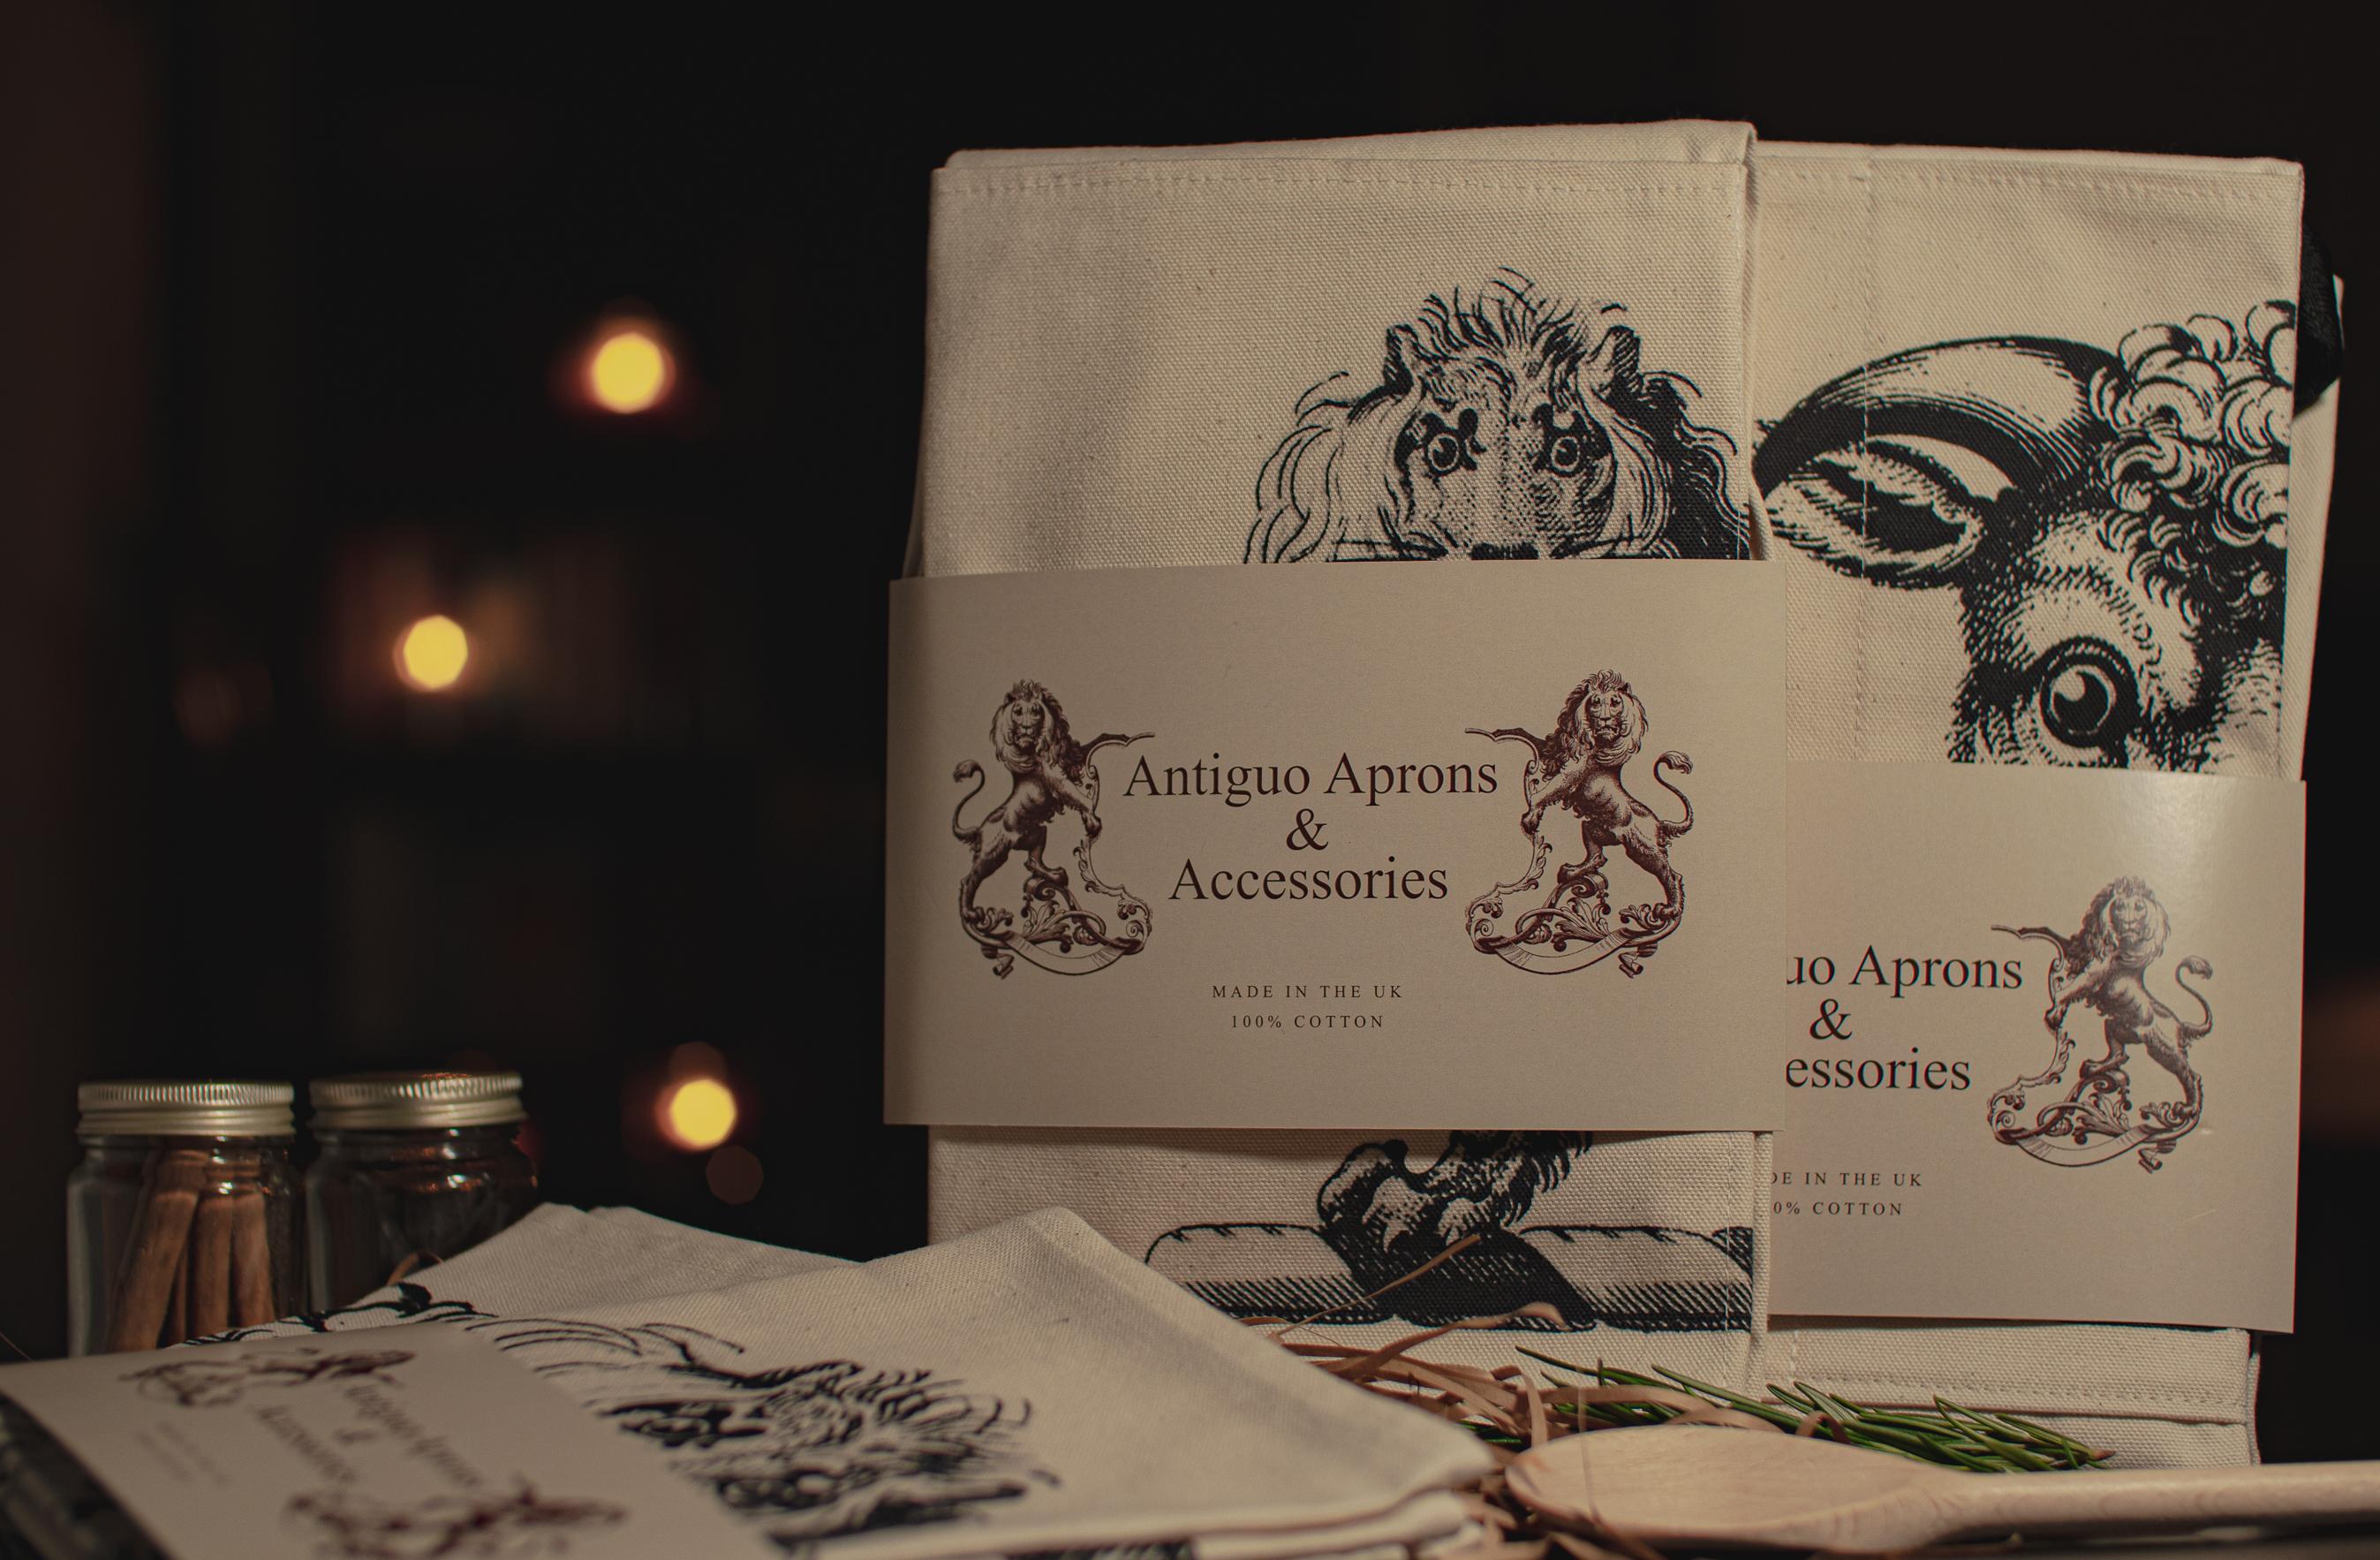 Antiguo Aprons